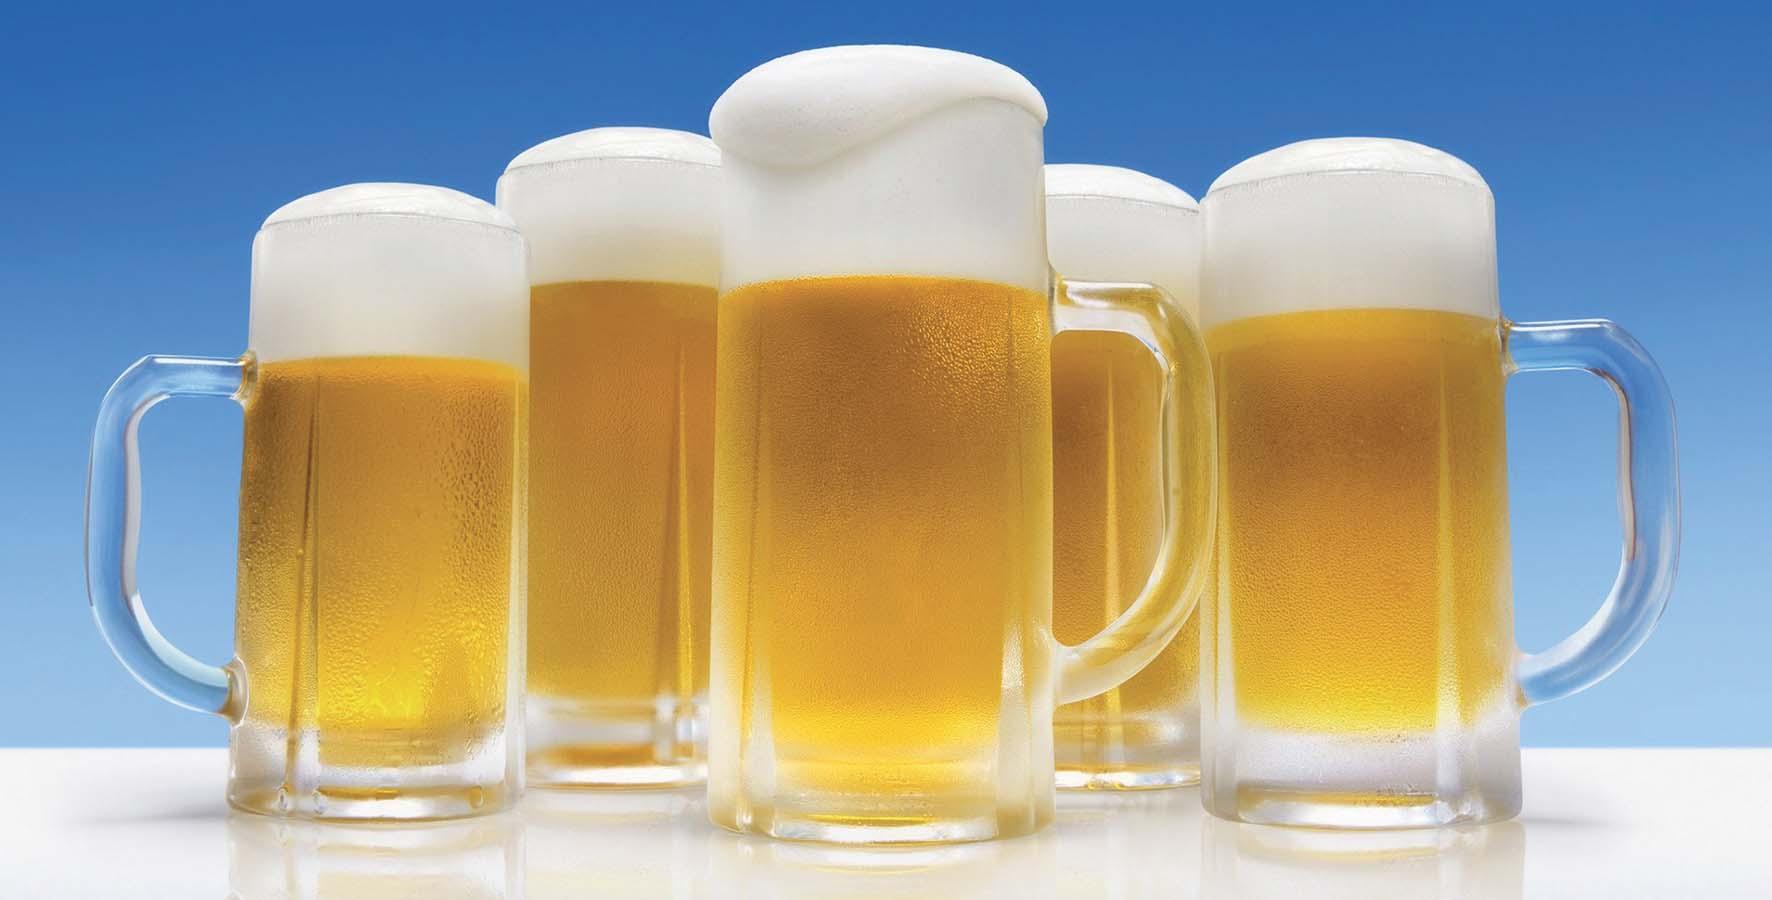 boccali birra bionda